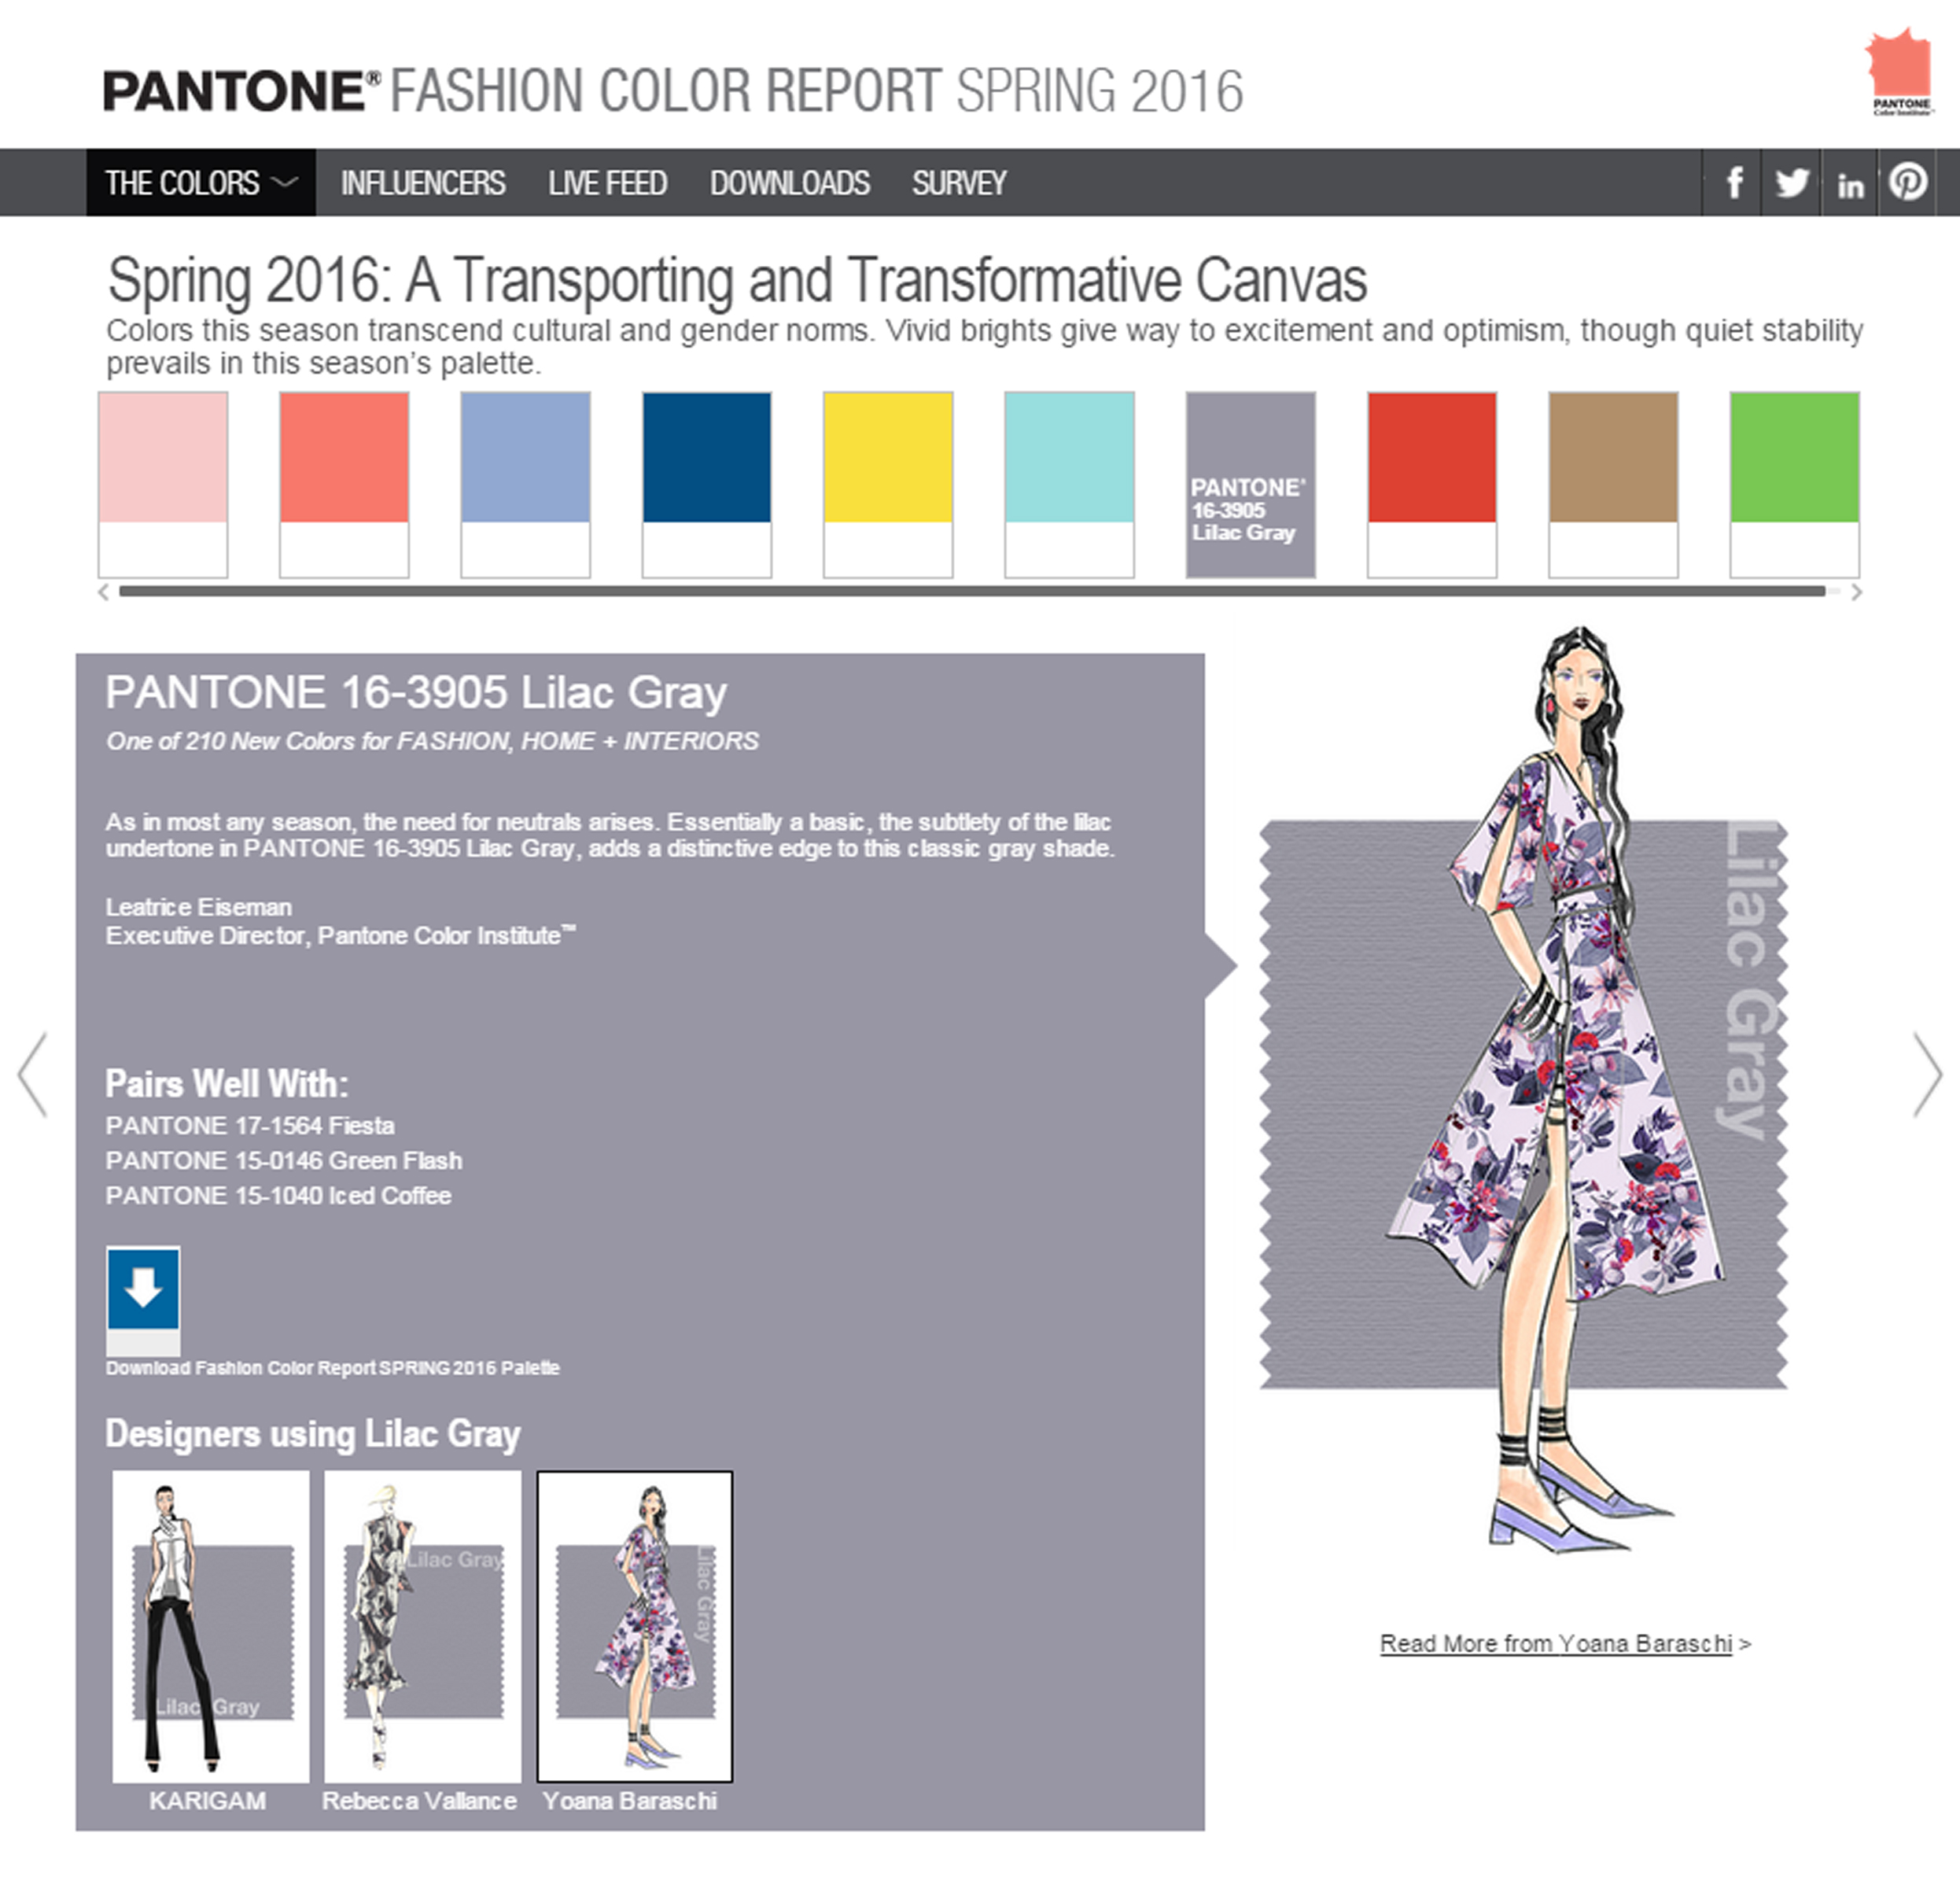 nyfw u2013 pantone spring 2016 color report yoana baraschi